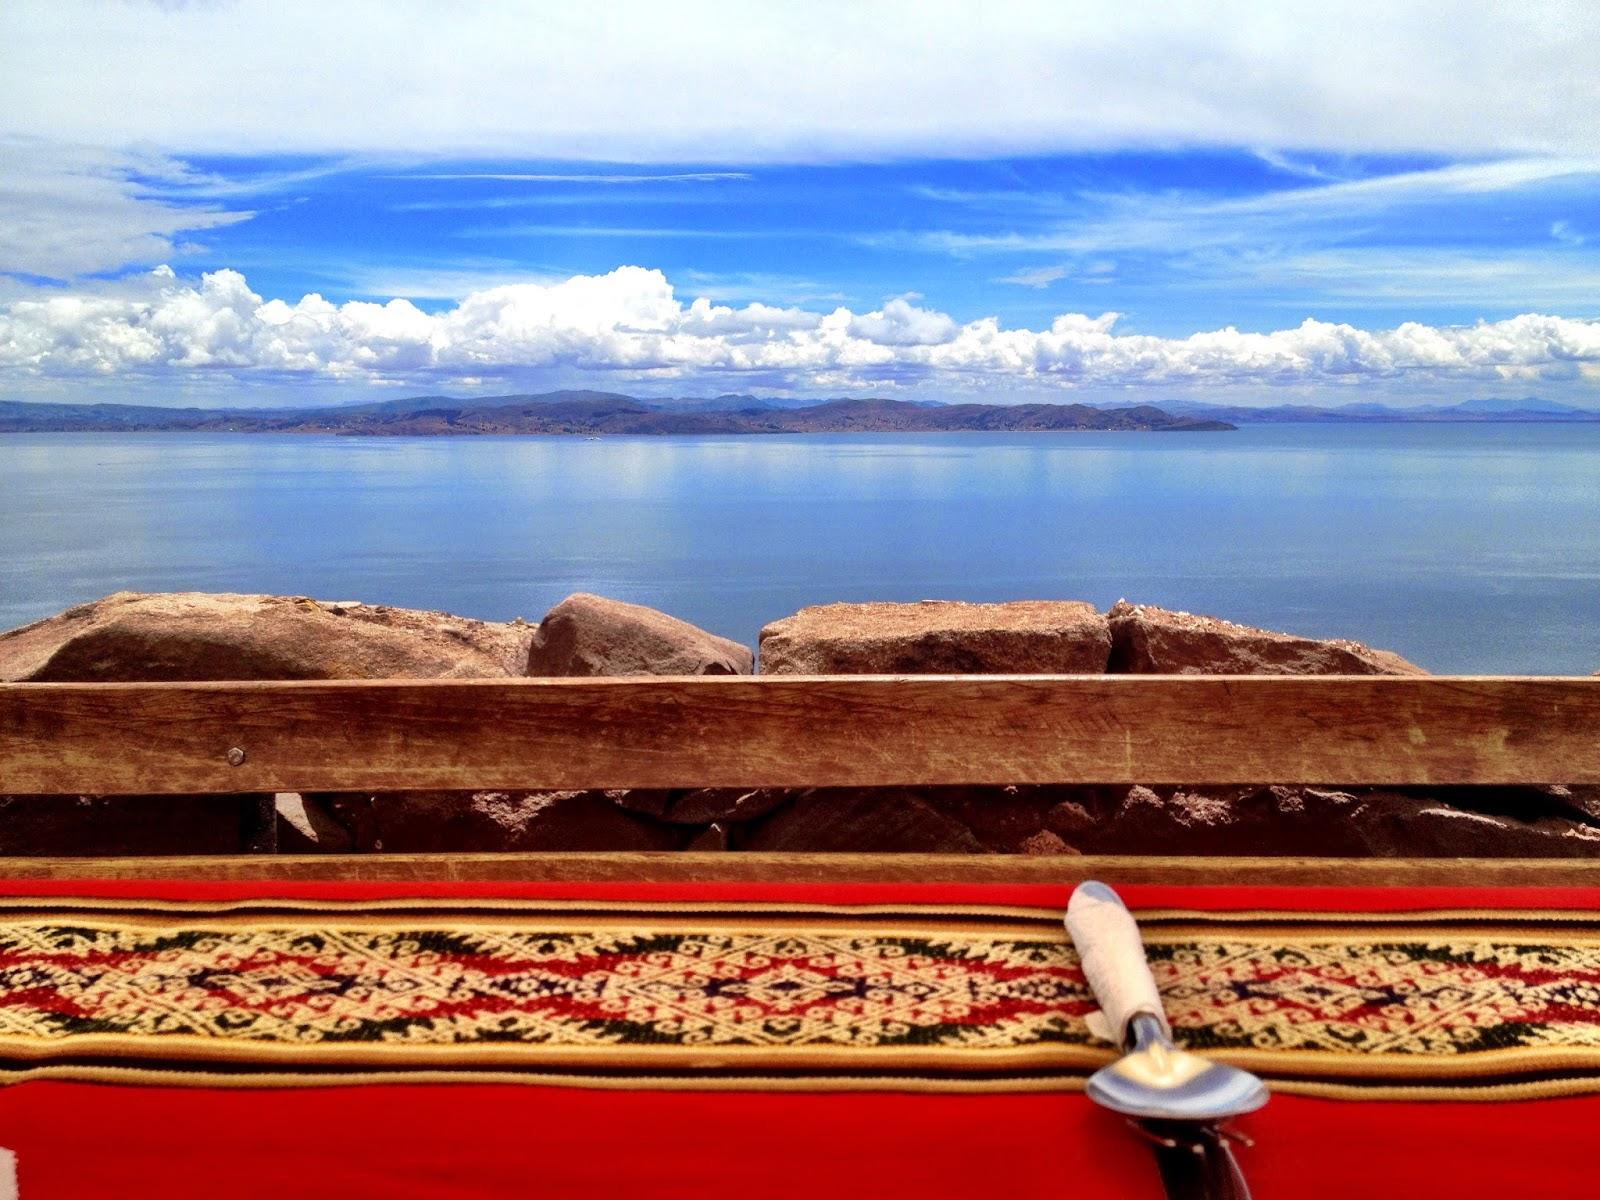 Lunch view on Taquile Island - Lake Titicaca, Peru